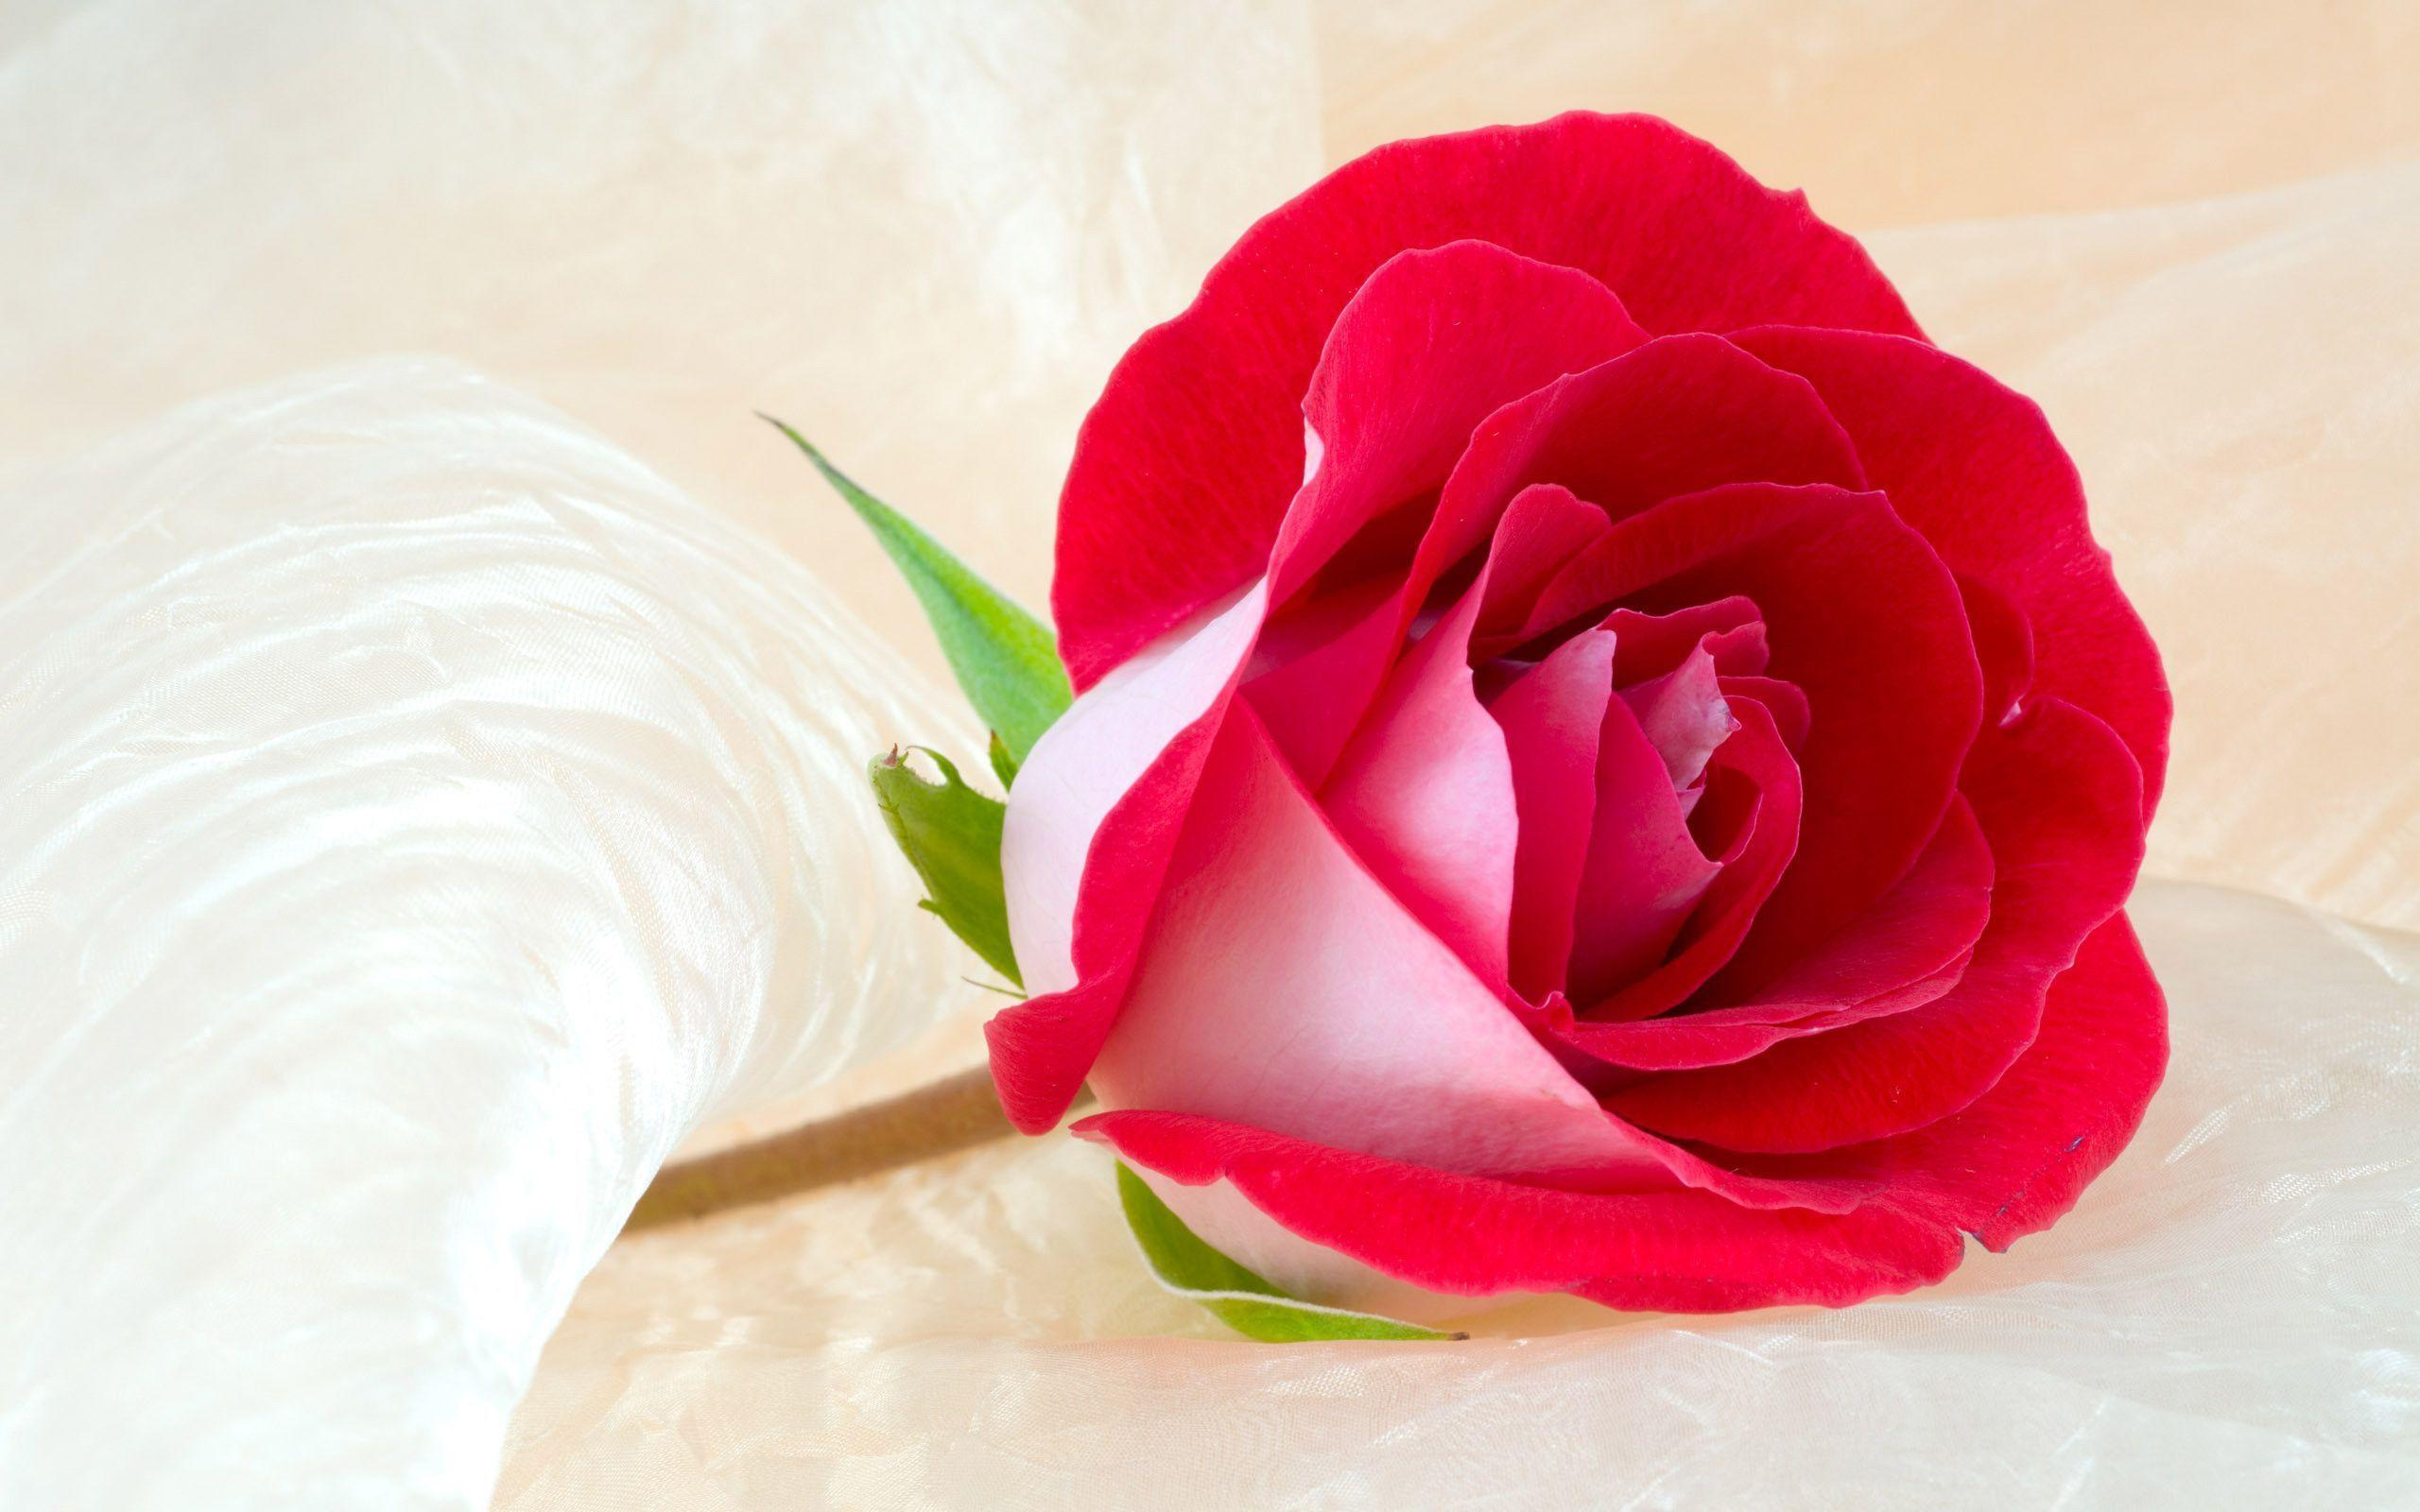 Rose Flower Wallpapers HD - Wallpaper Cave